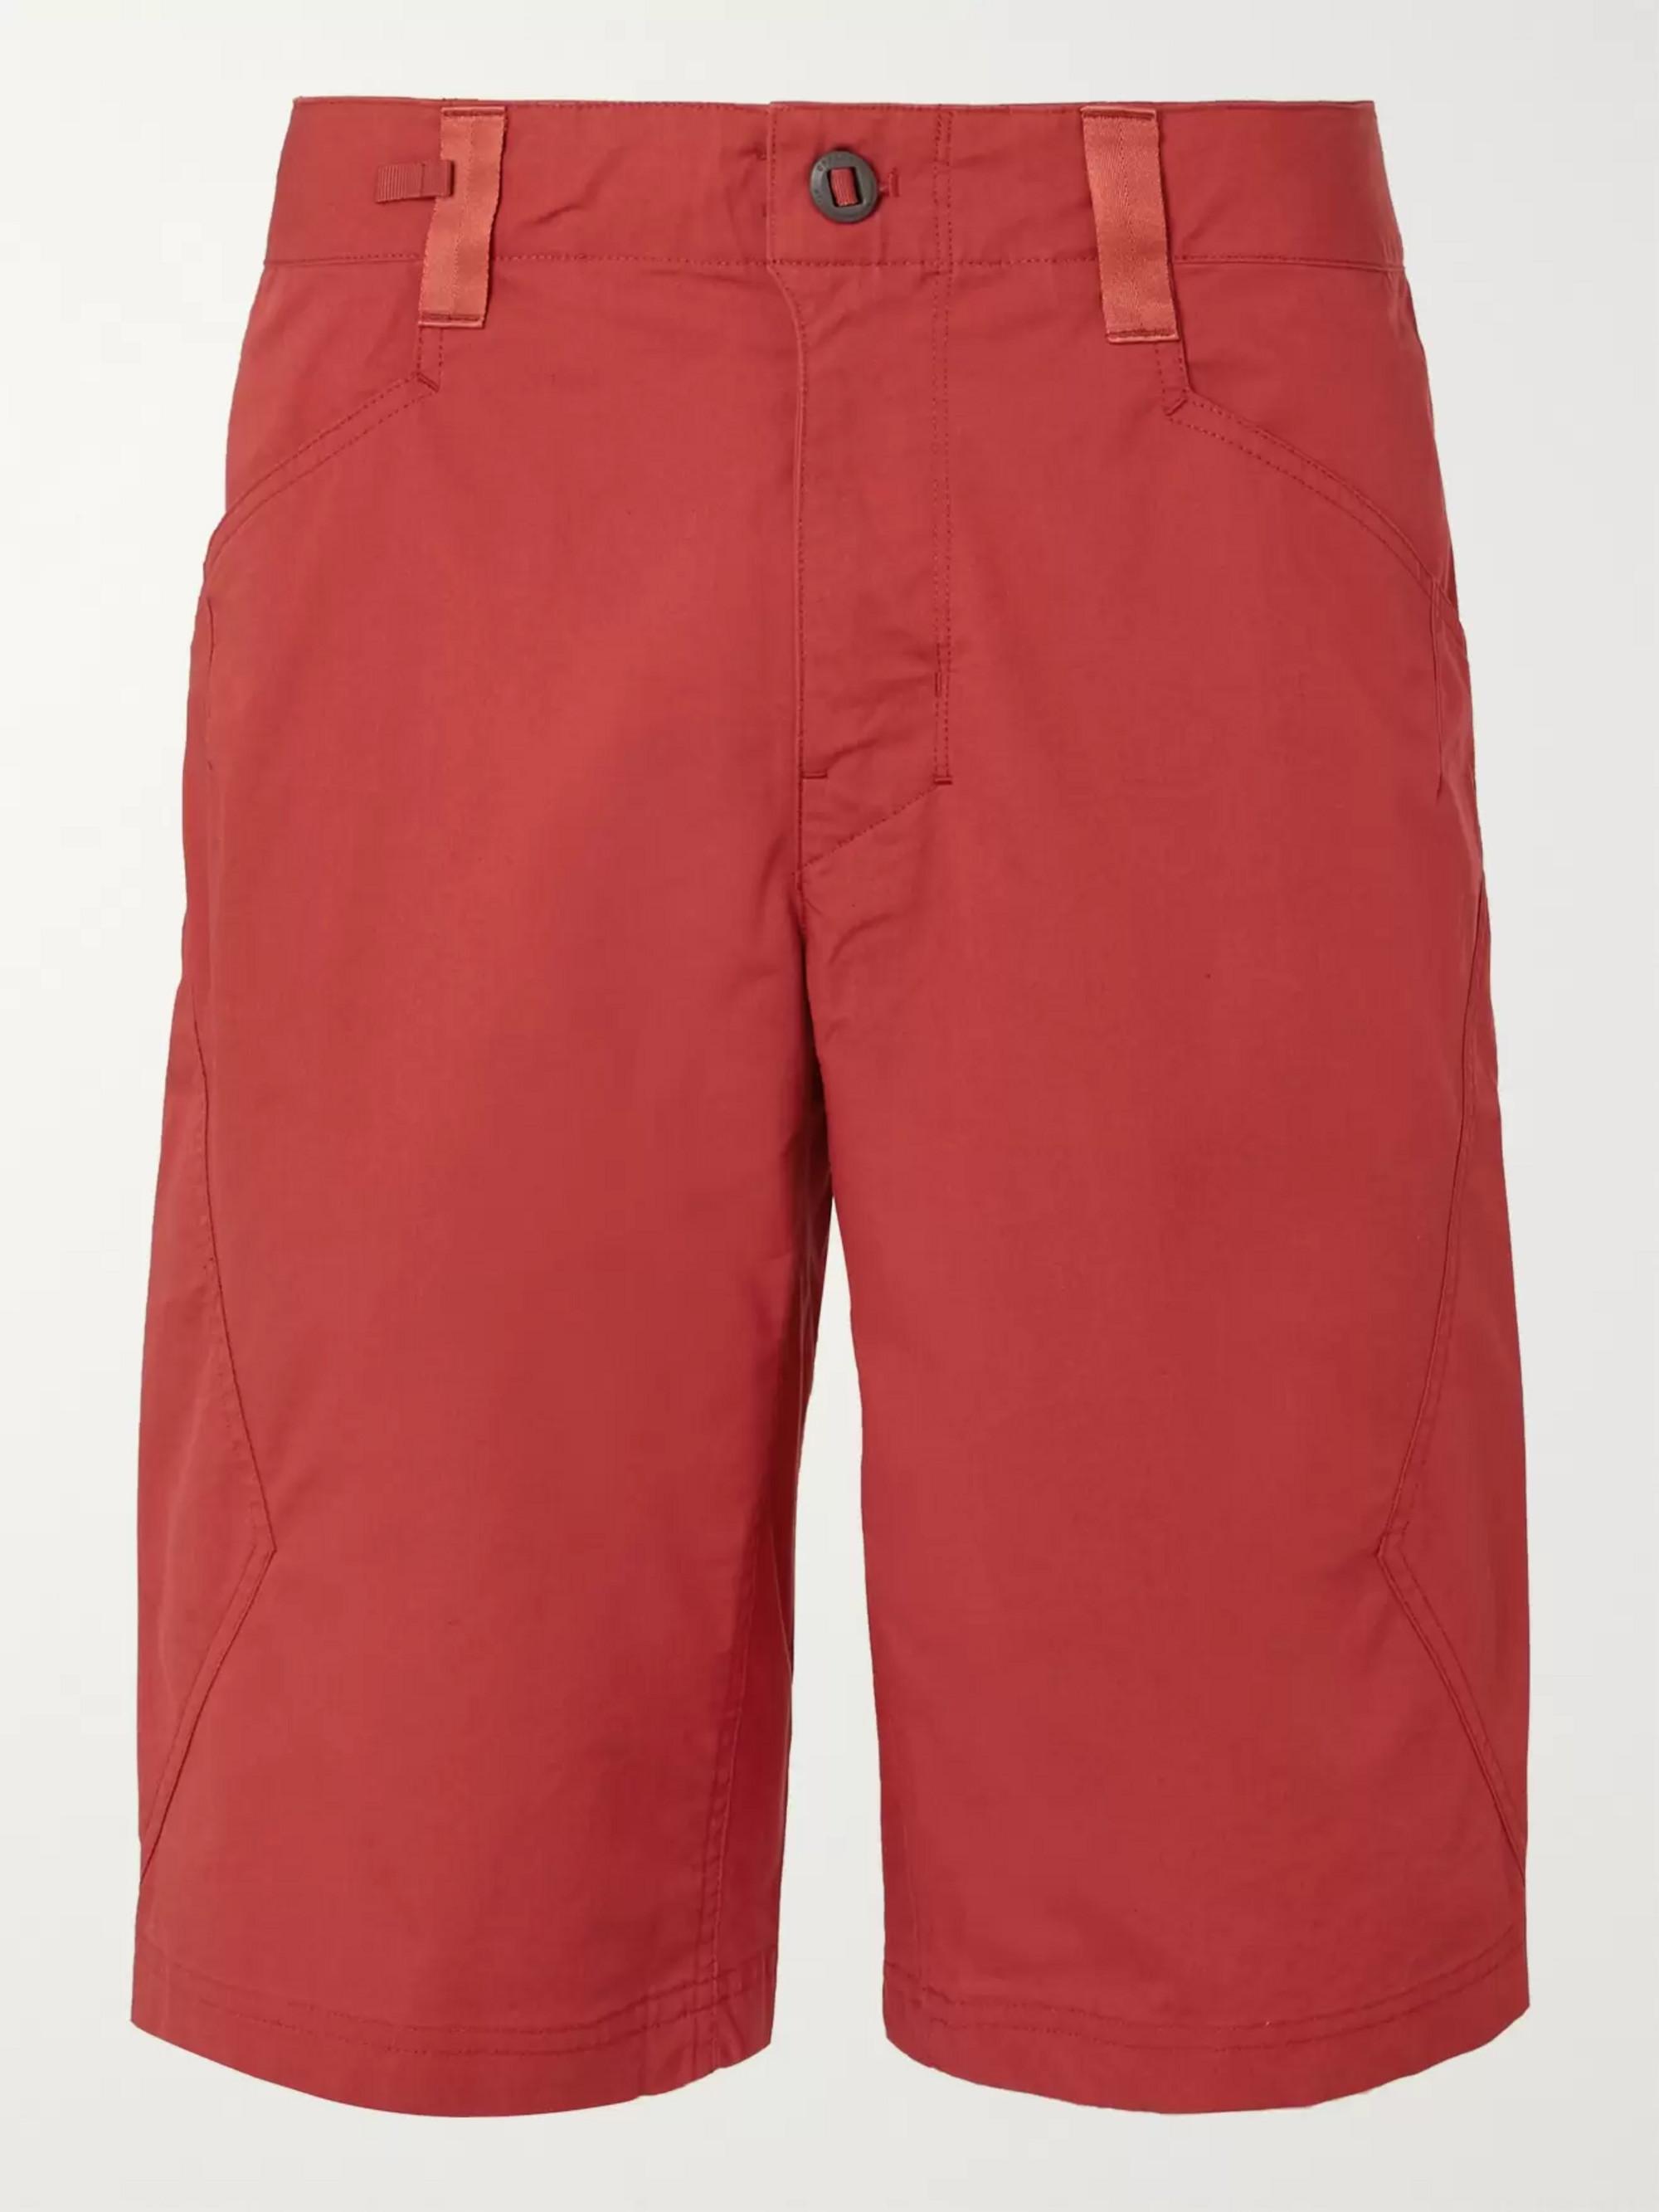 Venga Rock Organic Cotton Blend Shorts by Patagonia